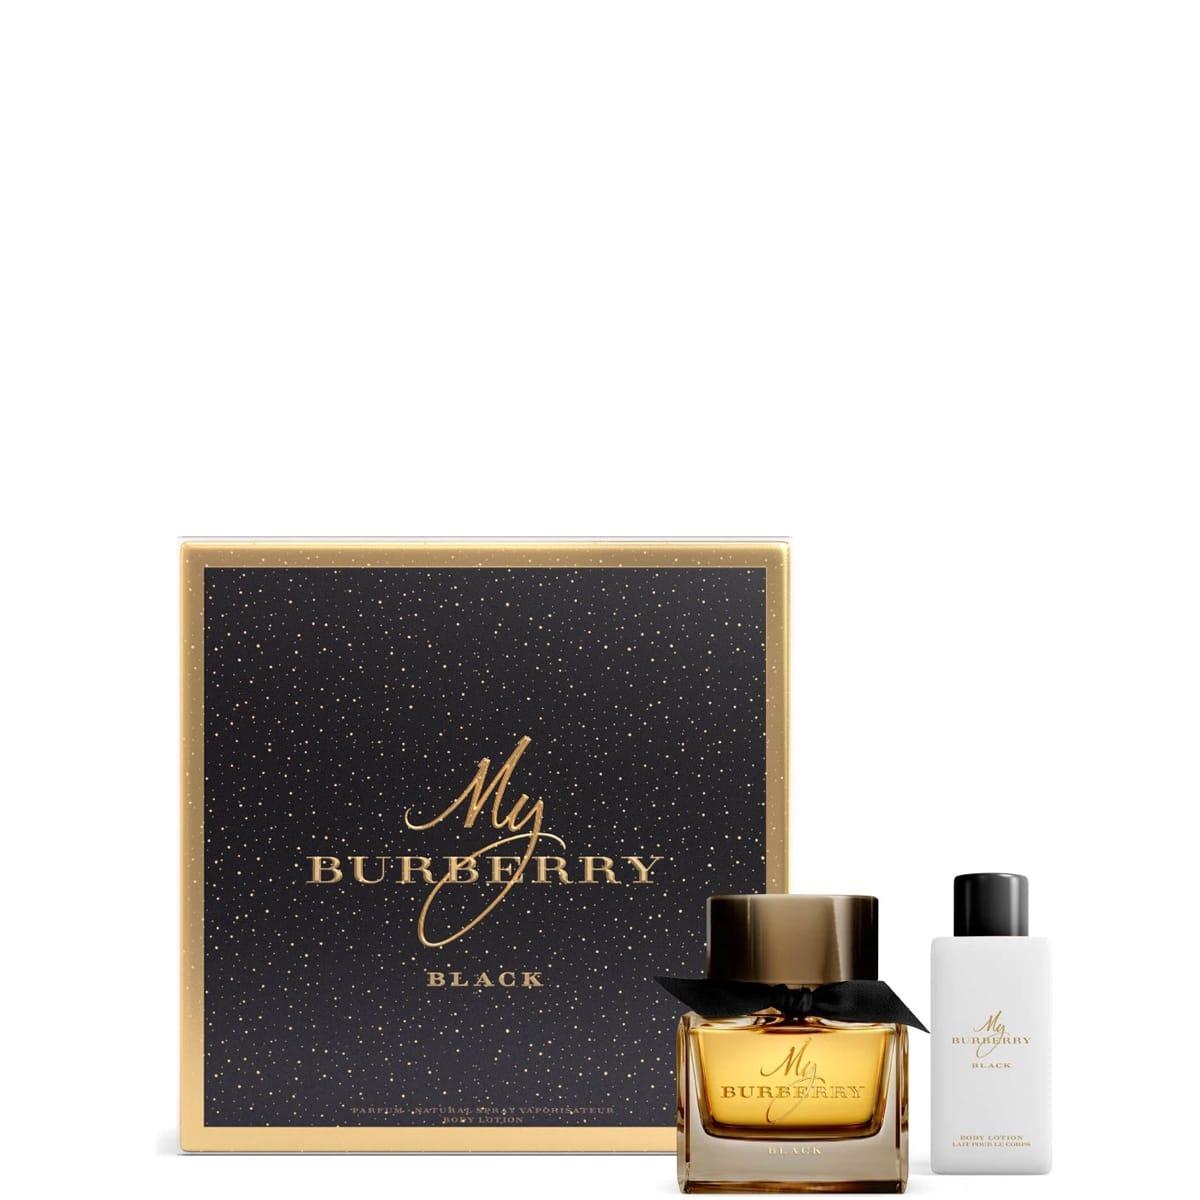 my burberry black coffret parfum incenza. Black Bedroom Furniture Sets. Home Design Ideas